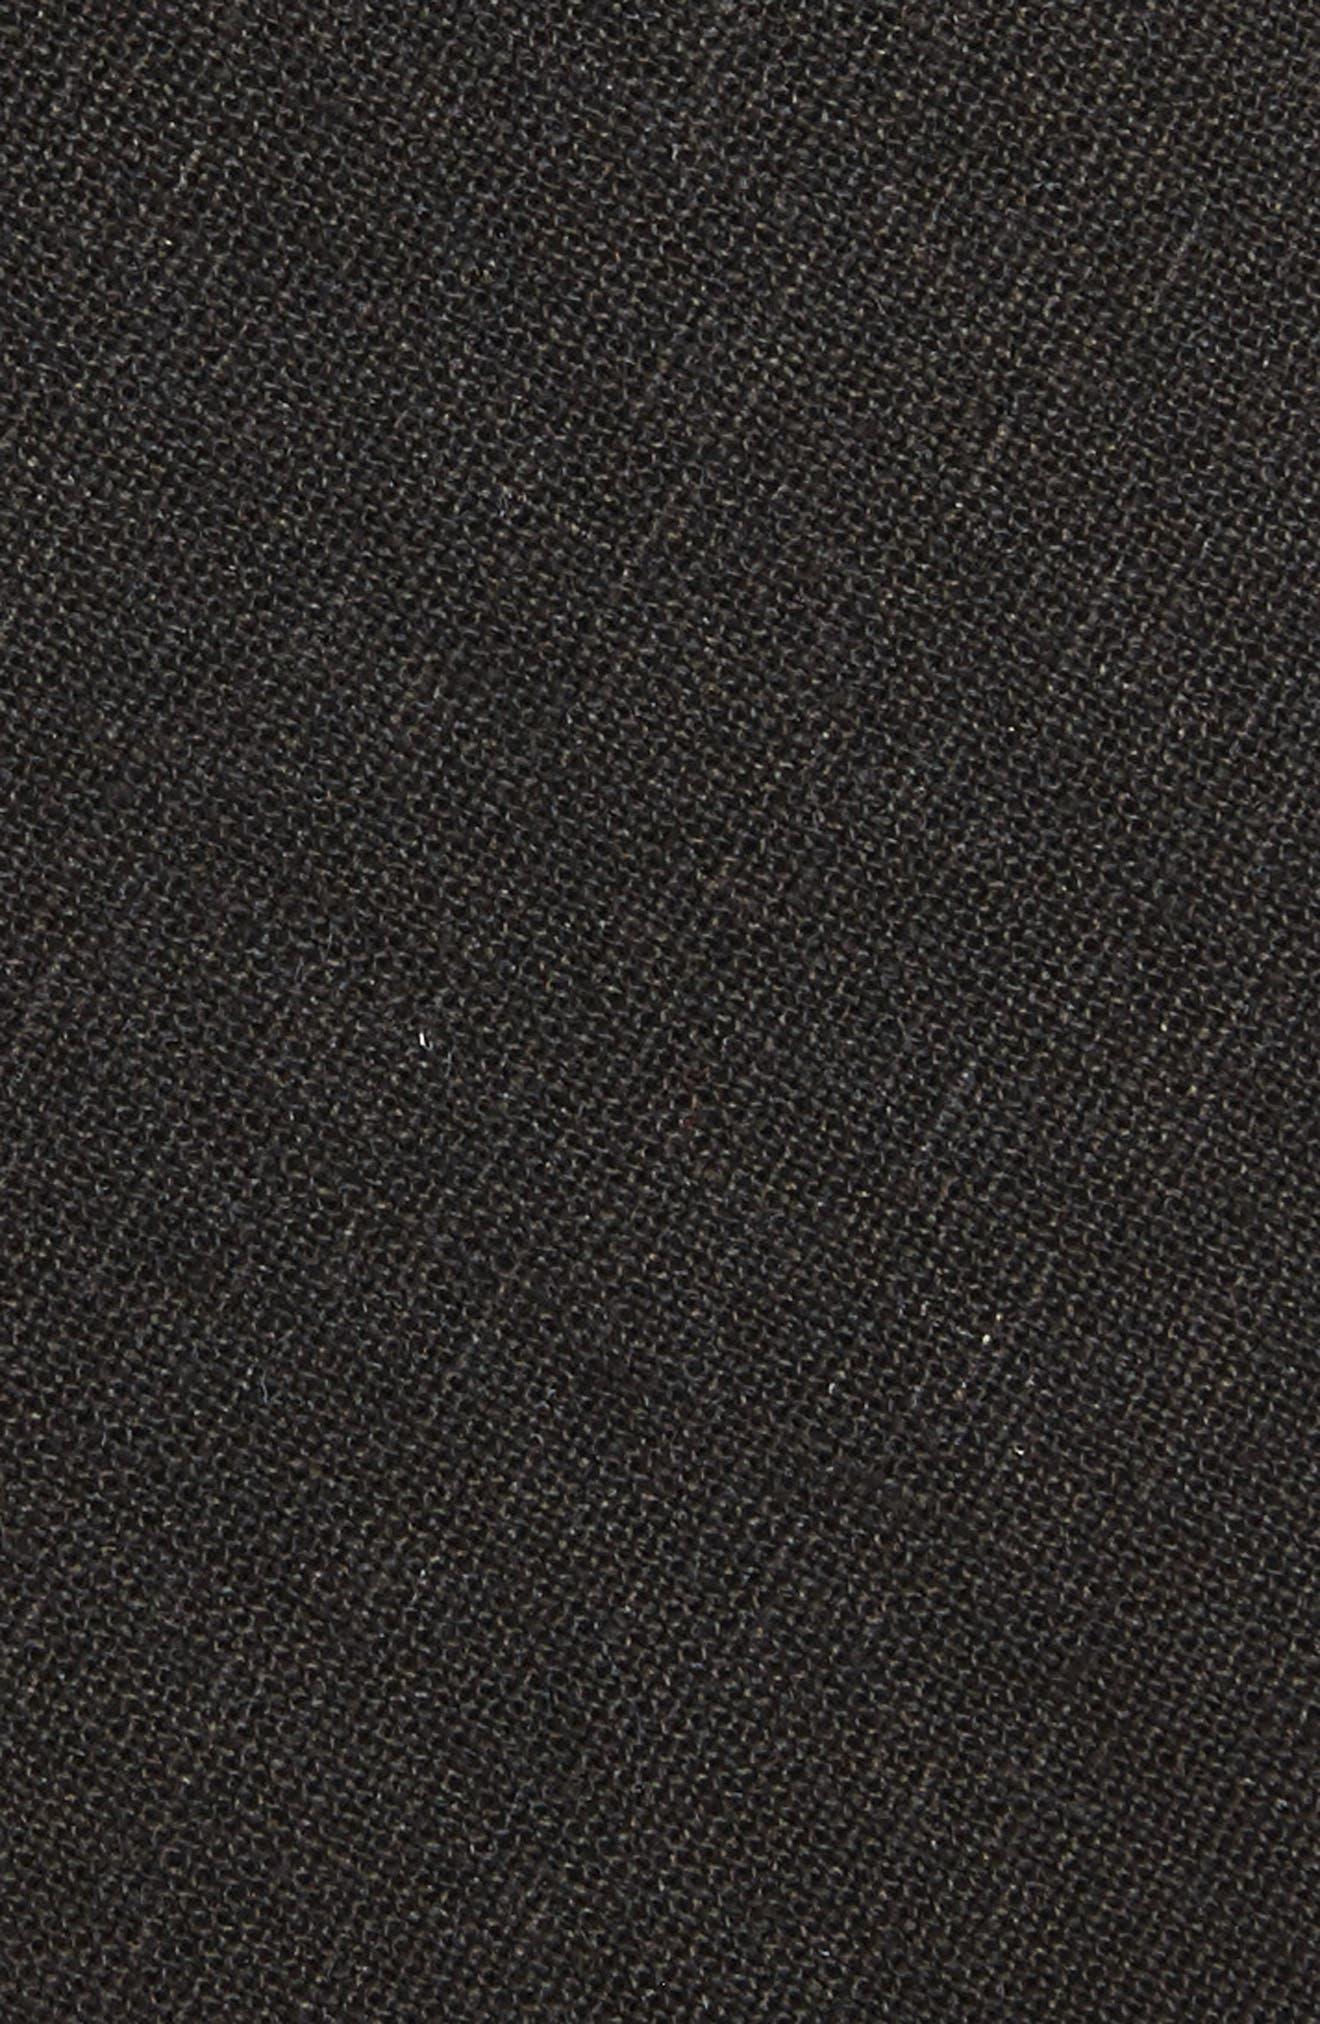 Alternate Image 2  - 1901 Solid Linen & Cotton Tie